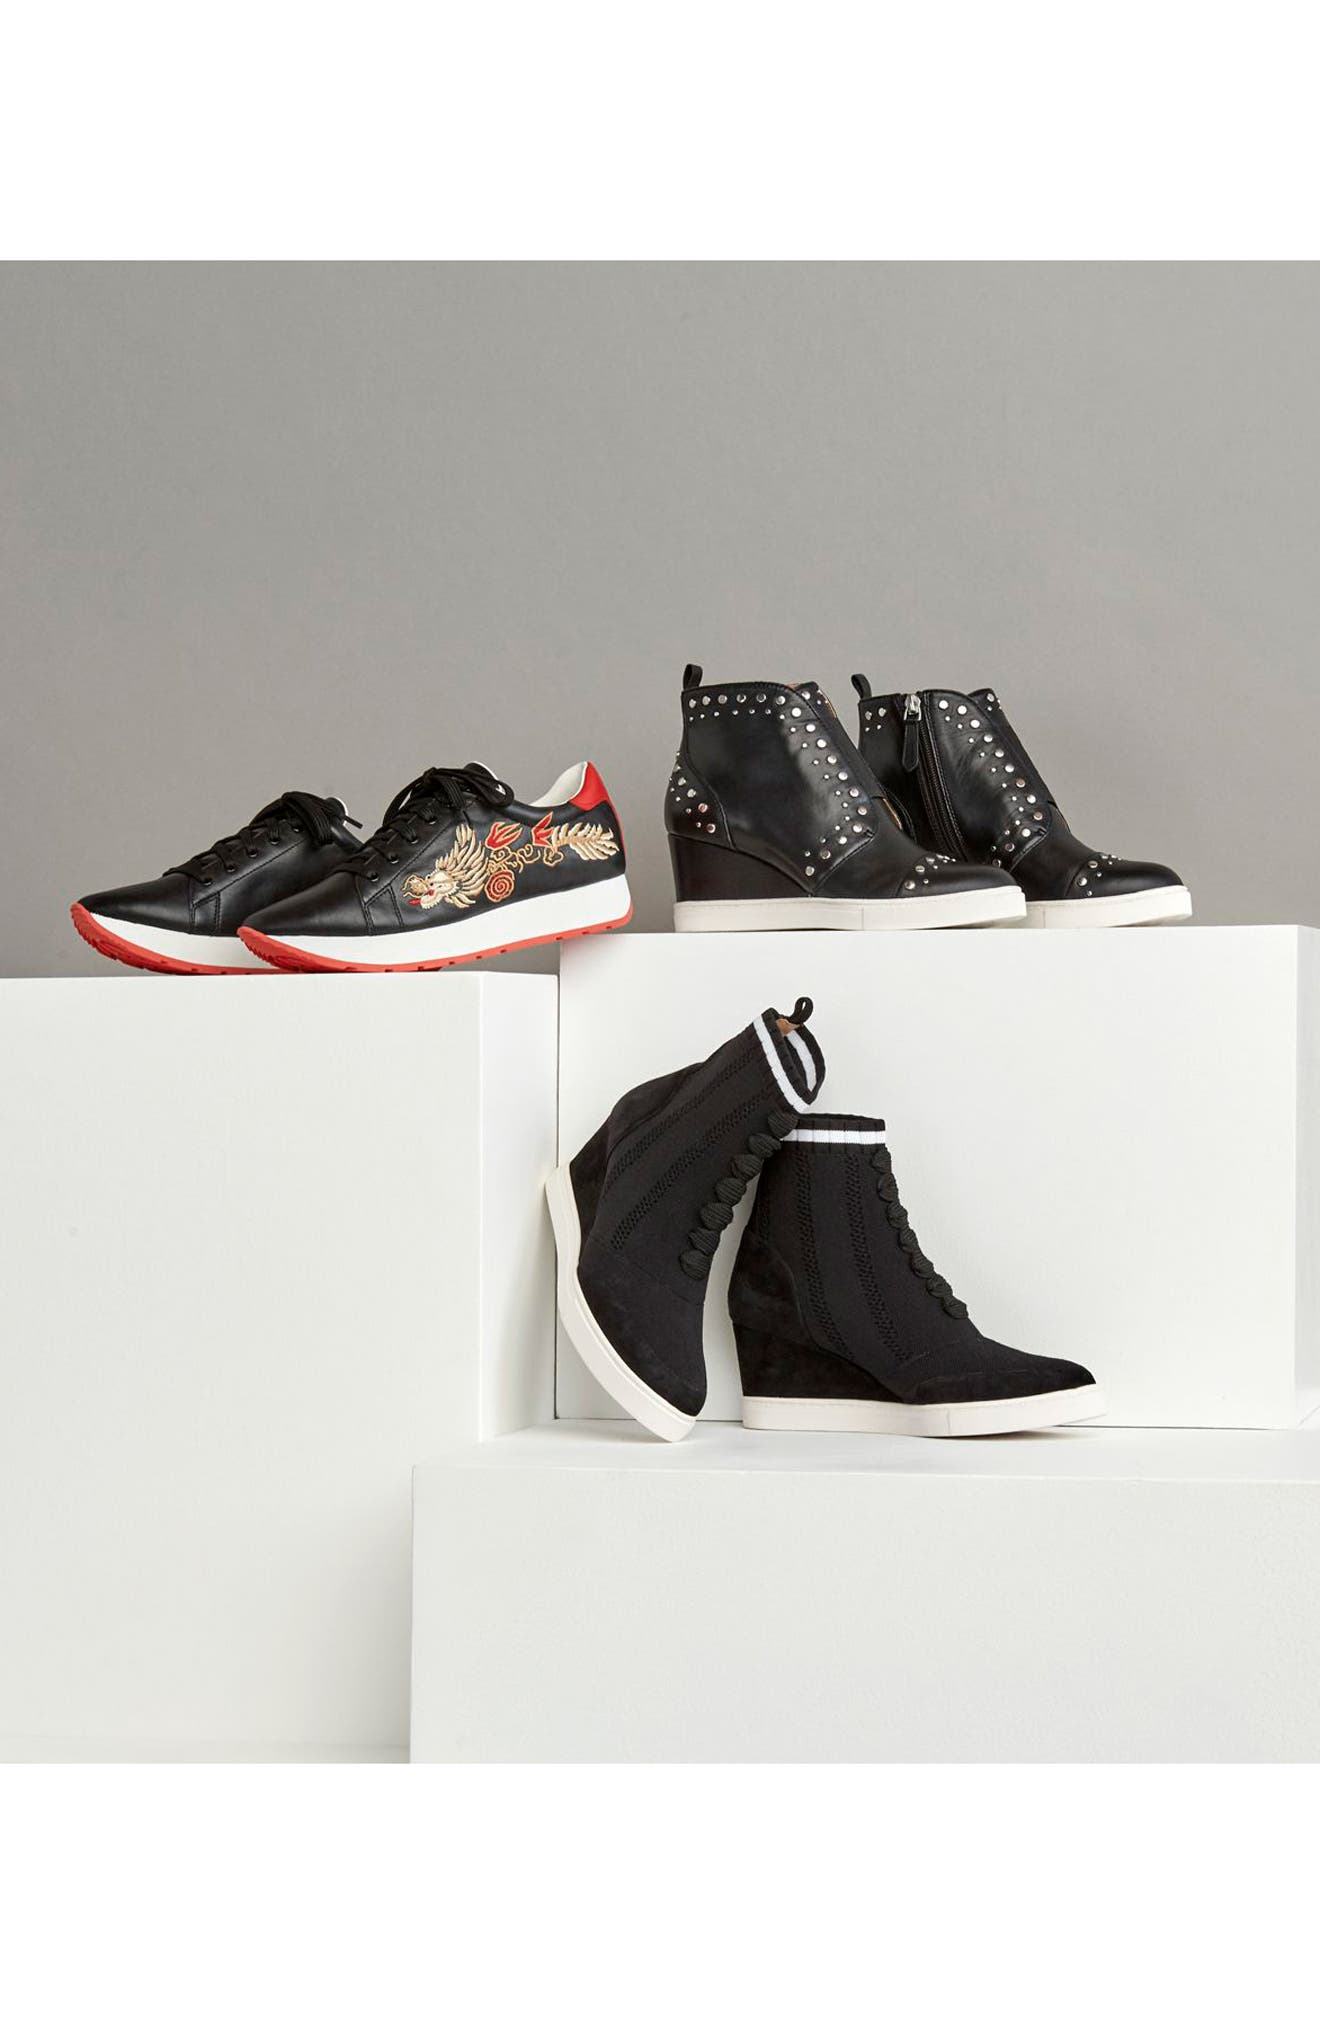 Fabiana Wedge Sneaker,                             Alternate thumbnail 7, color,                             BLACK SUEDE